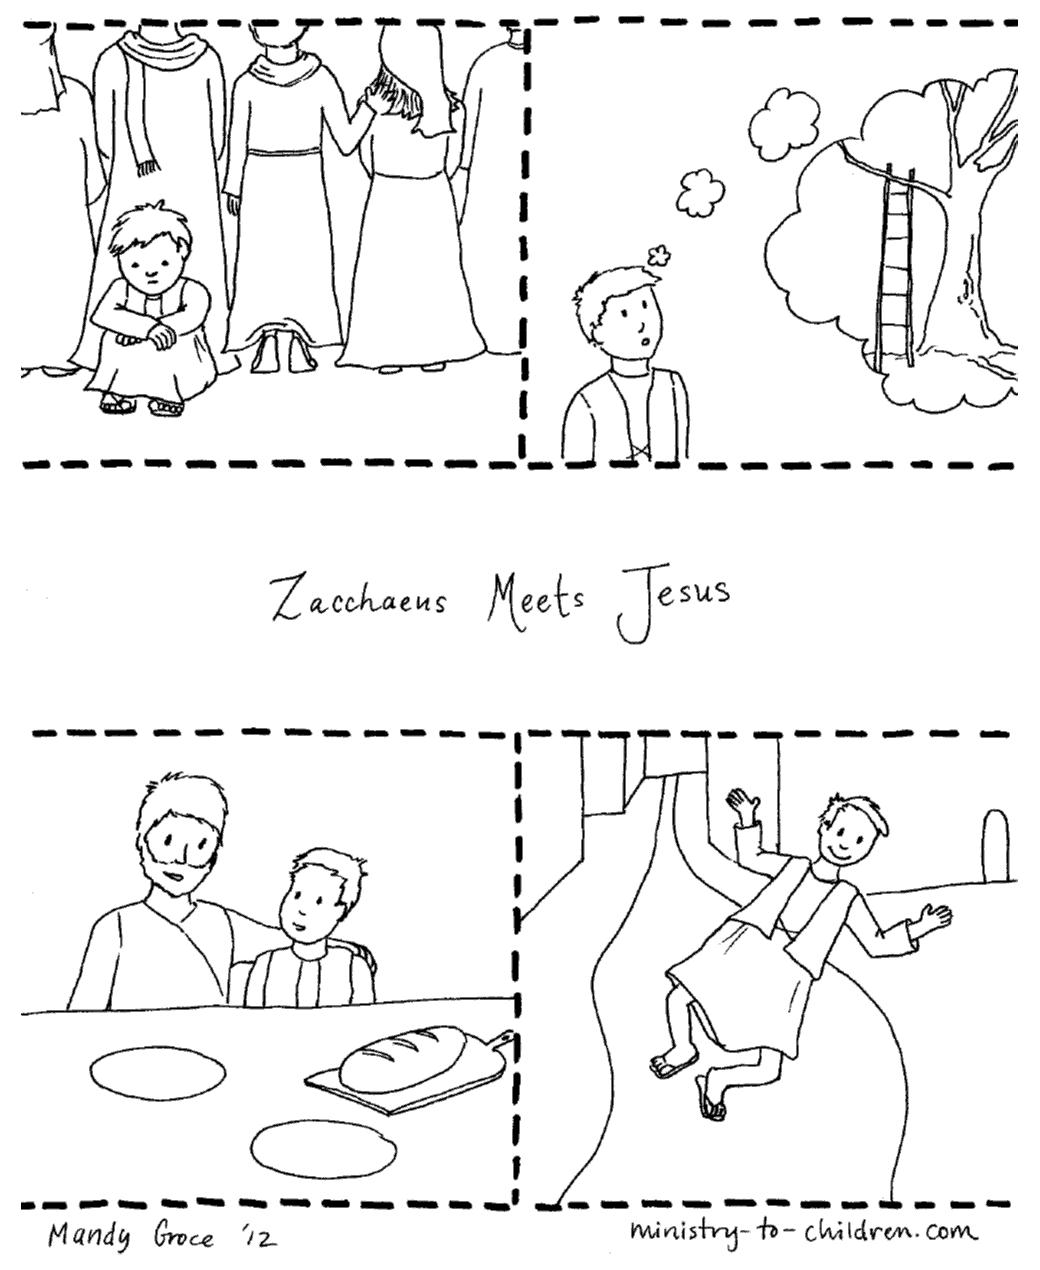 Zacchaeus & Jesus Coloring Page (Free Printable)